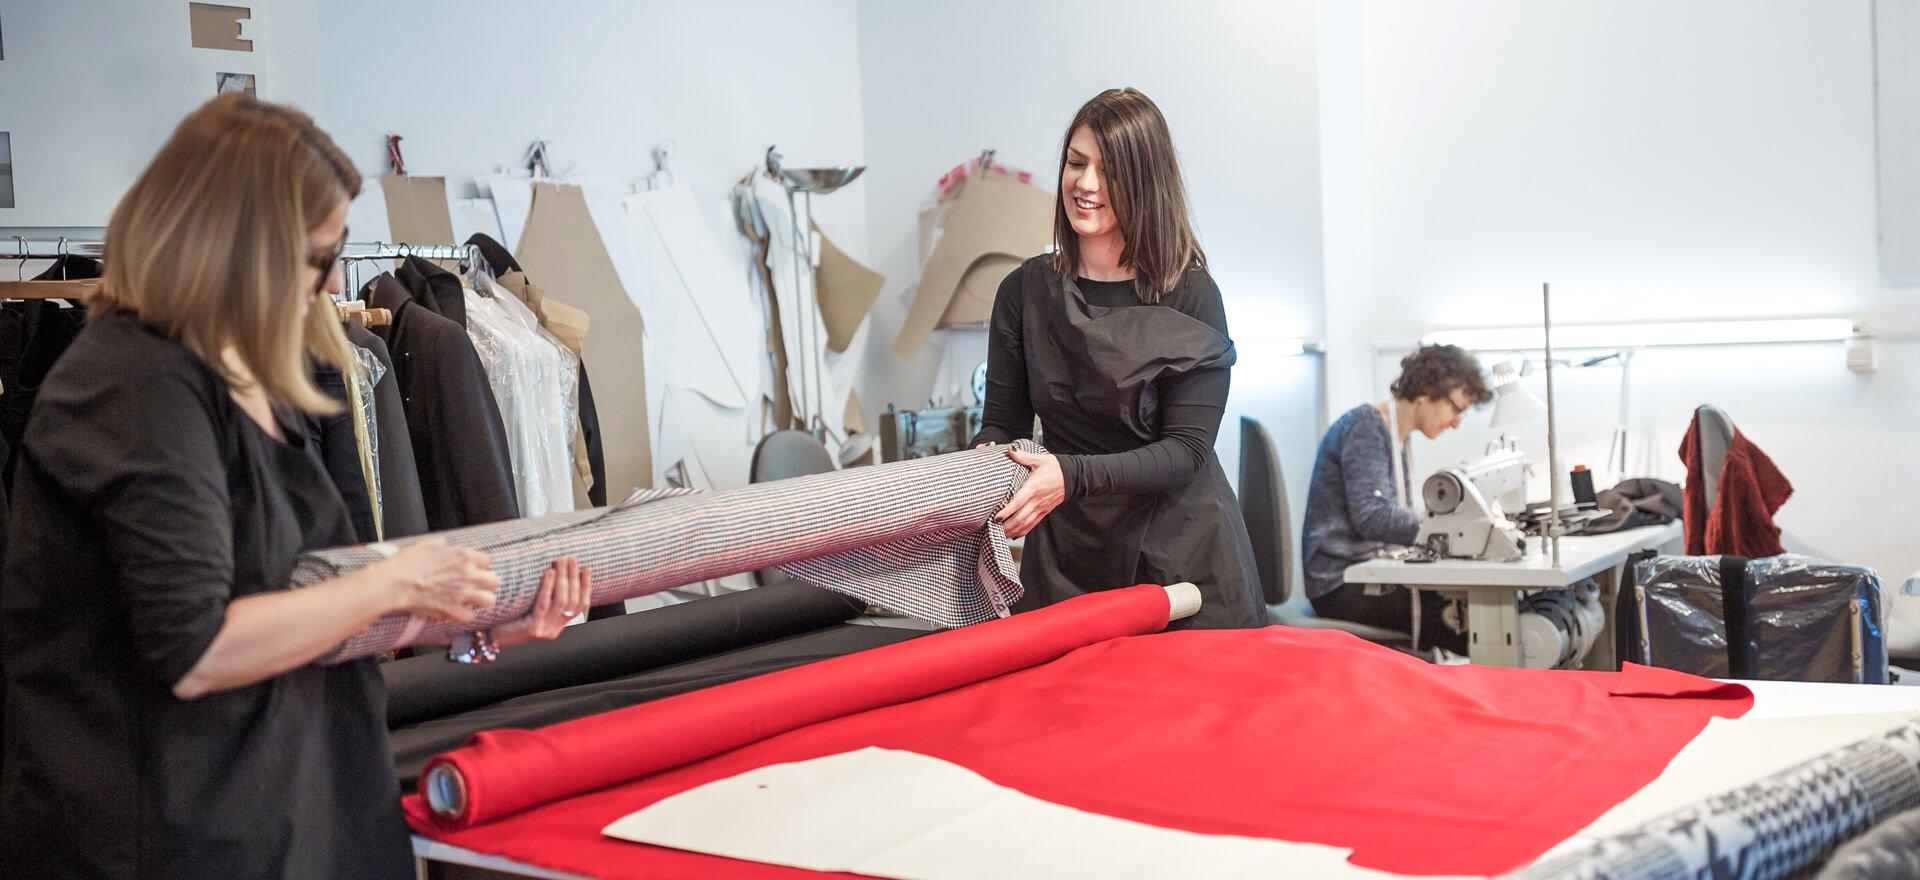 Find A Fabric | Moula Good Business www.moula.com.au